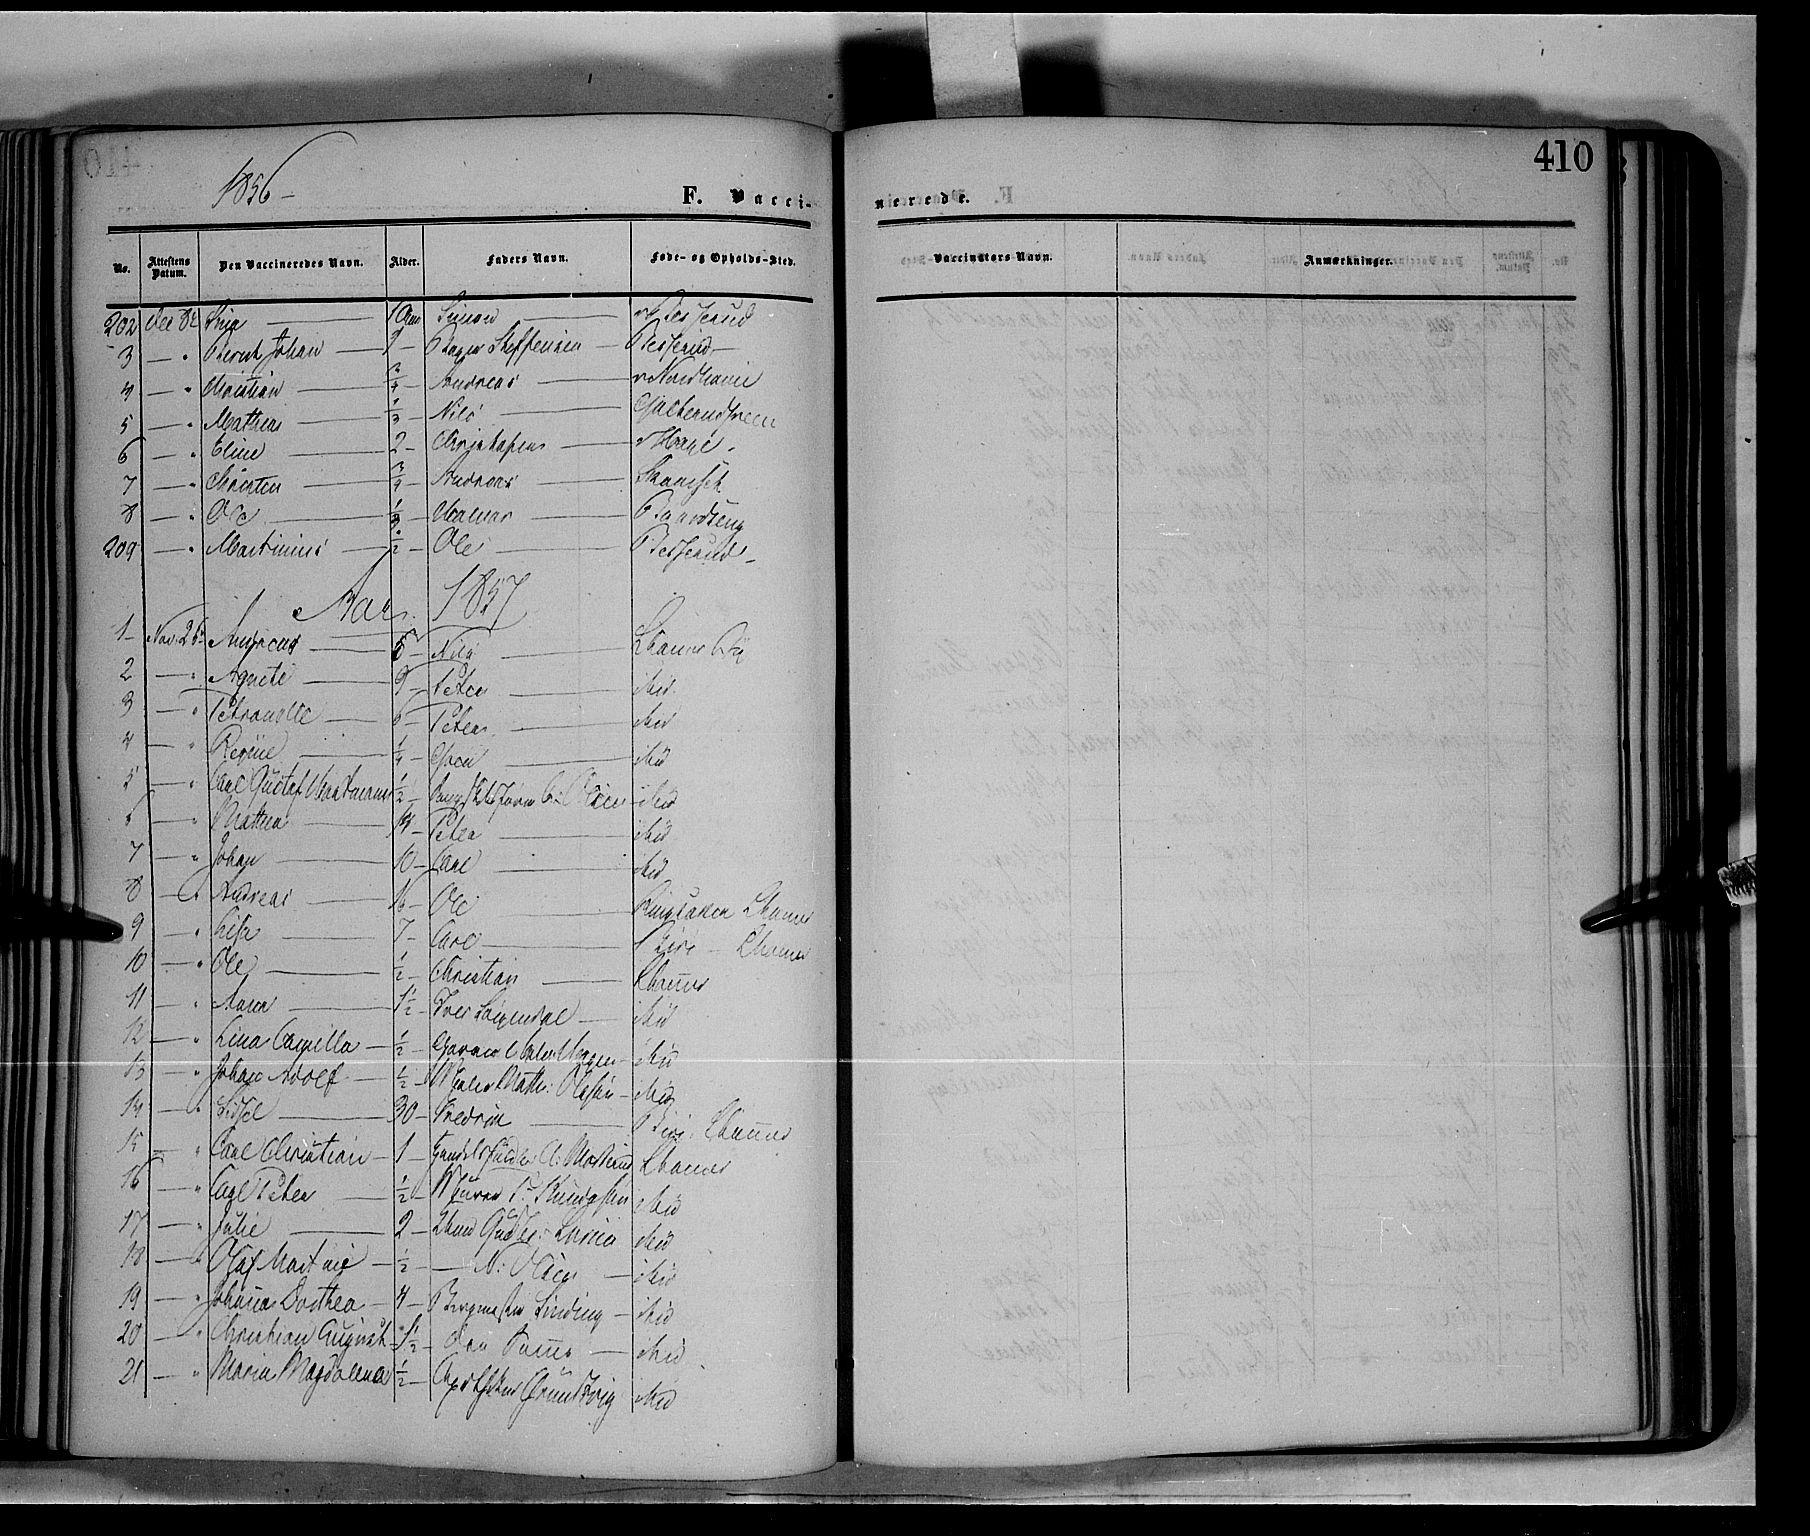 SAH, Fåberg prestekontor, Ministerialbok nr. 6B, 1855-1867, s. 410